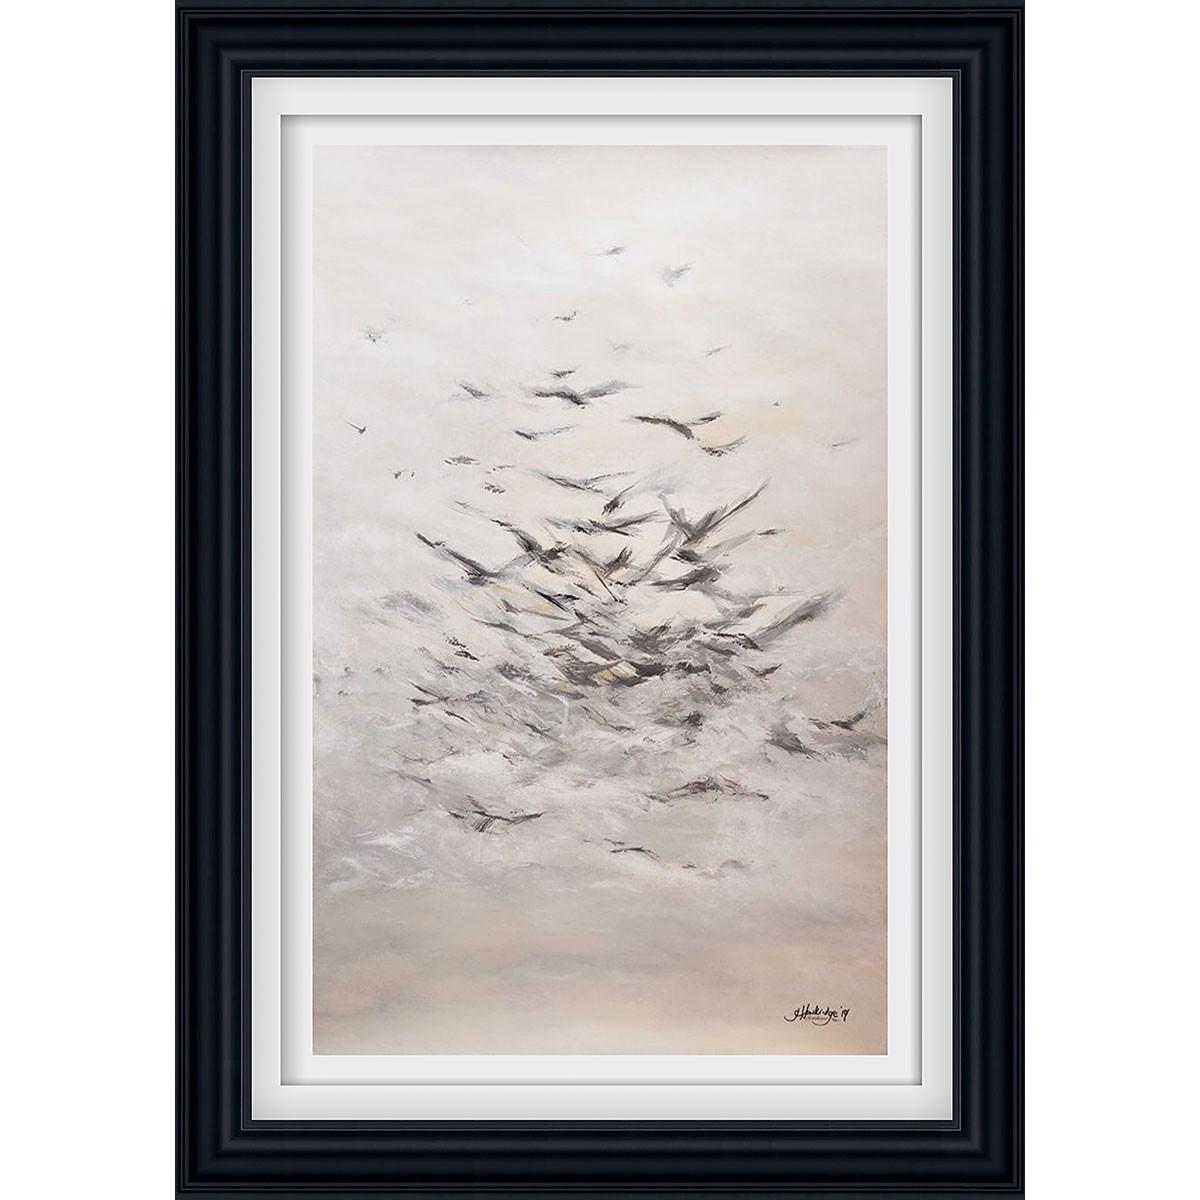 A Migration Black - Large